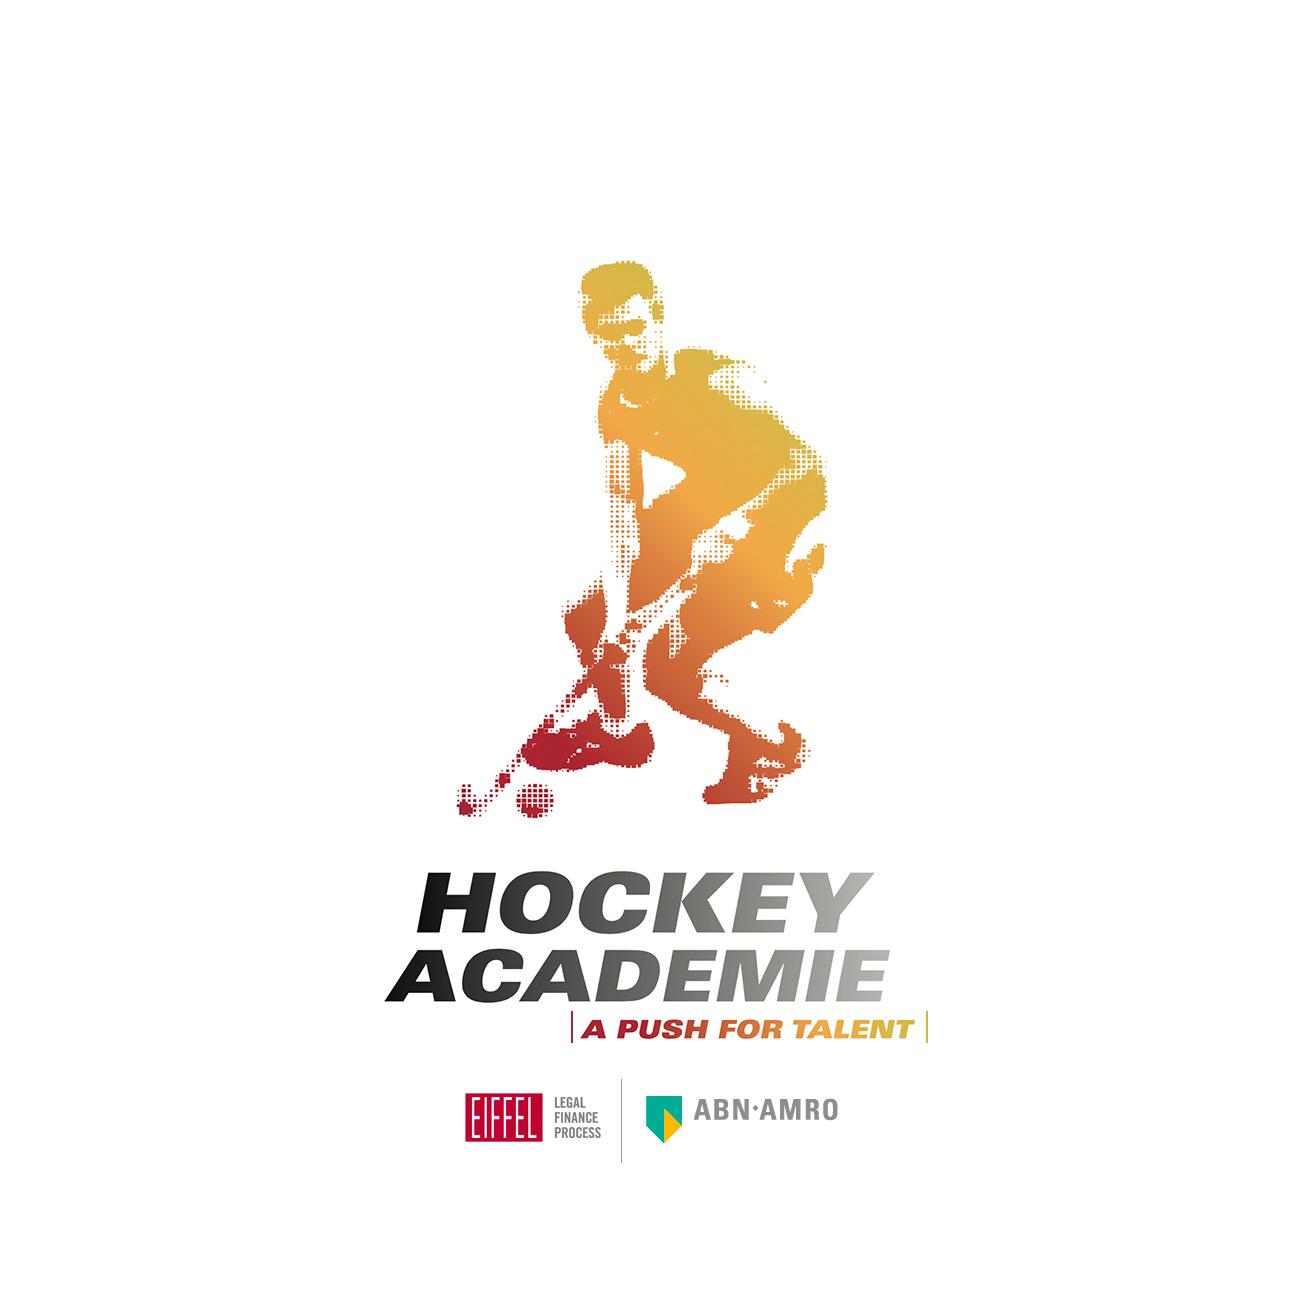 Alle ParaHockey skills van de ABN-AMRO / Eiffel Hockey Academie staan nu online